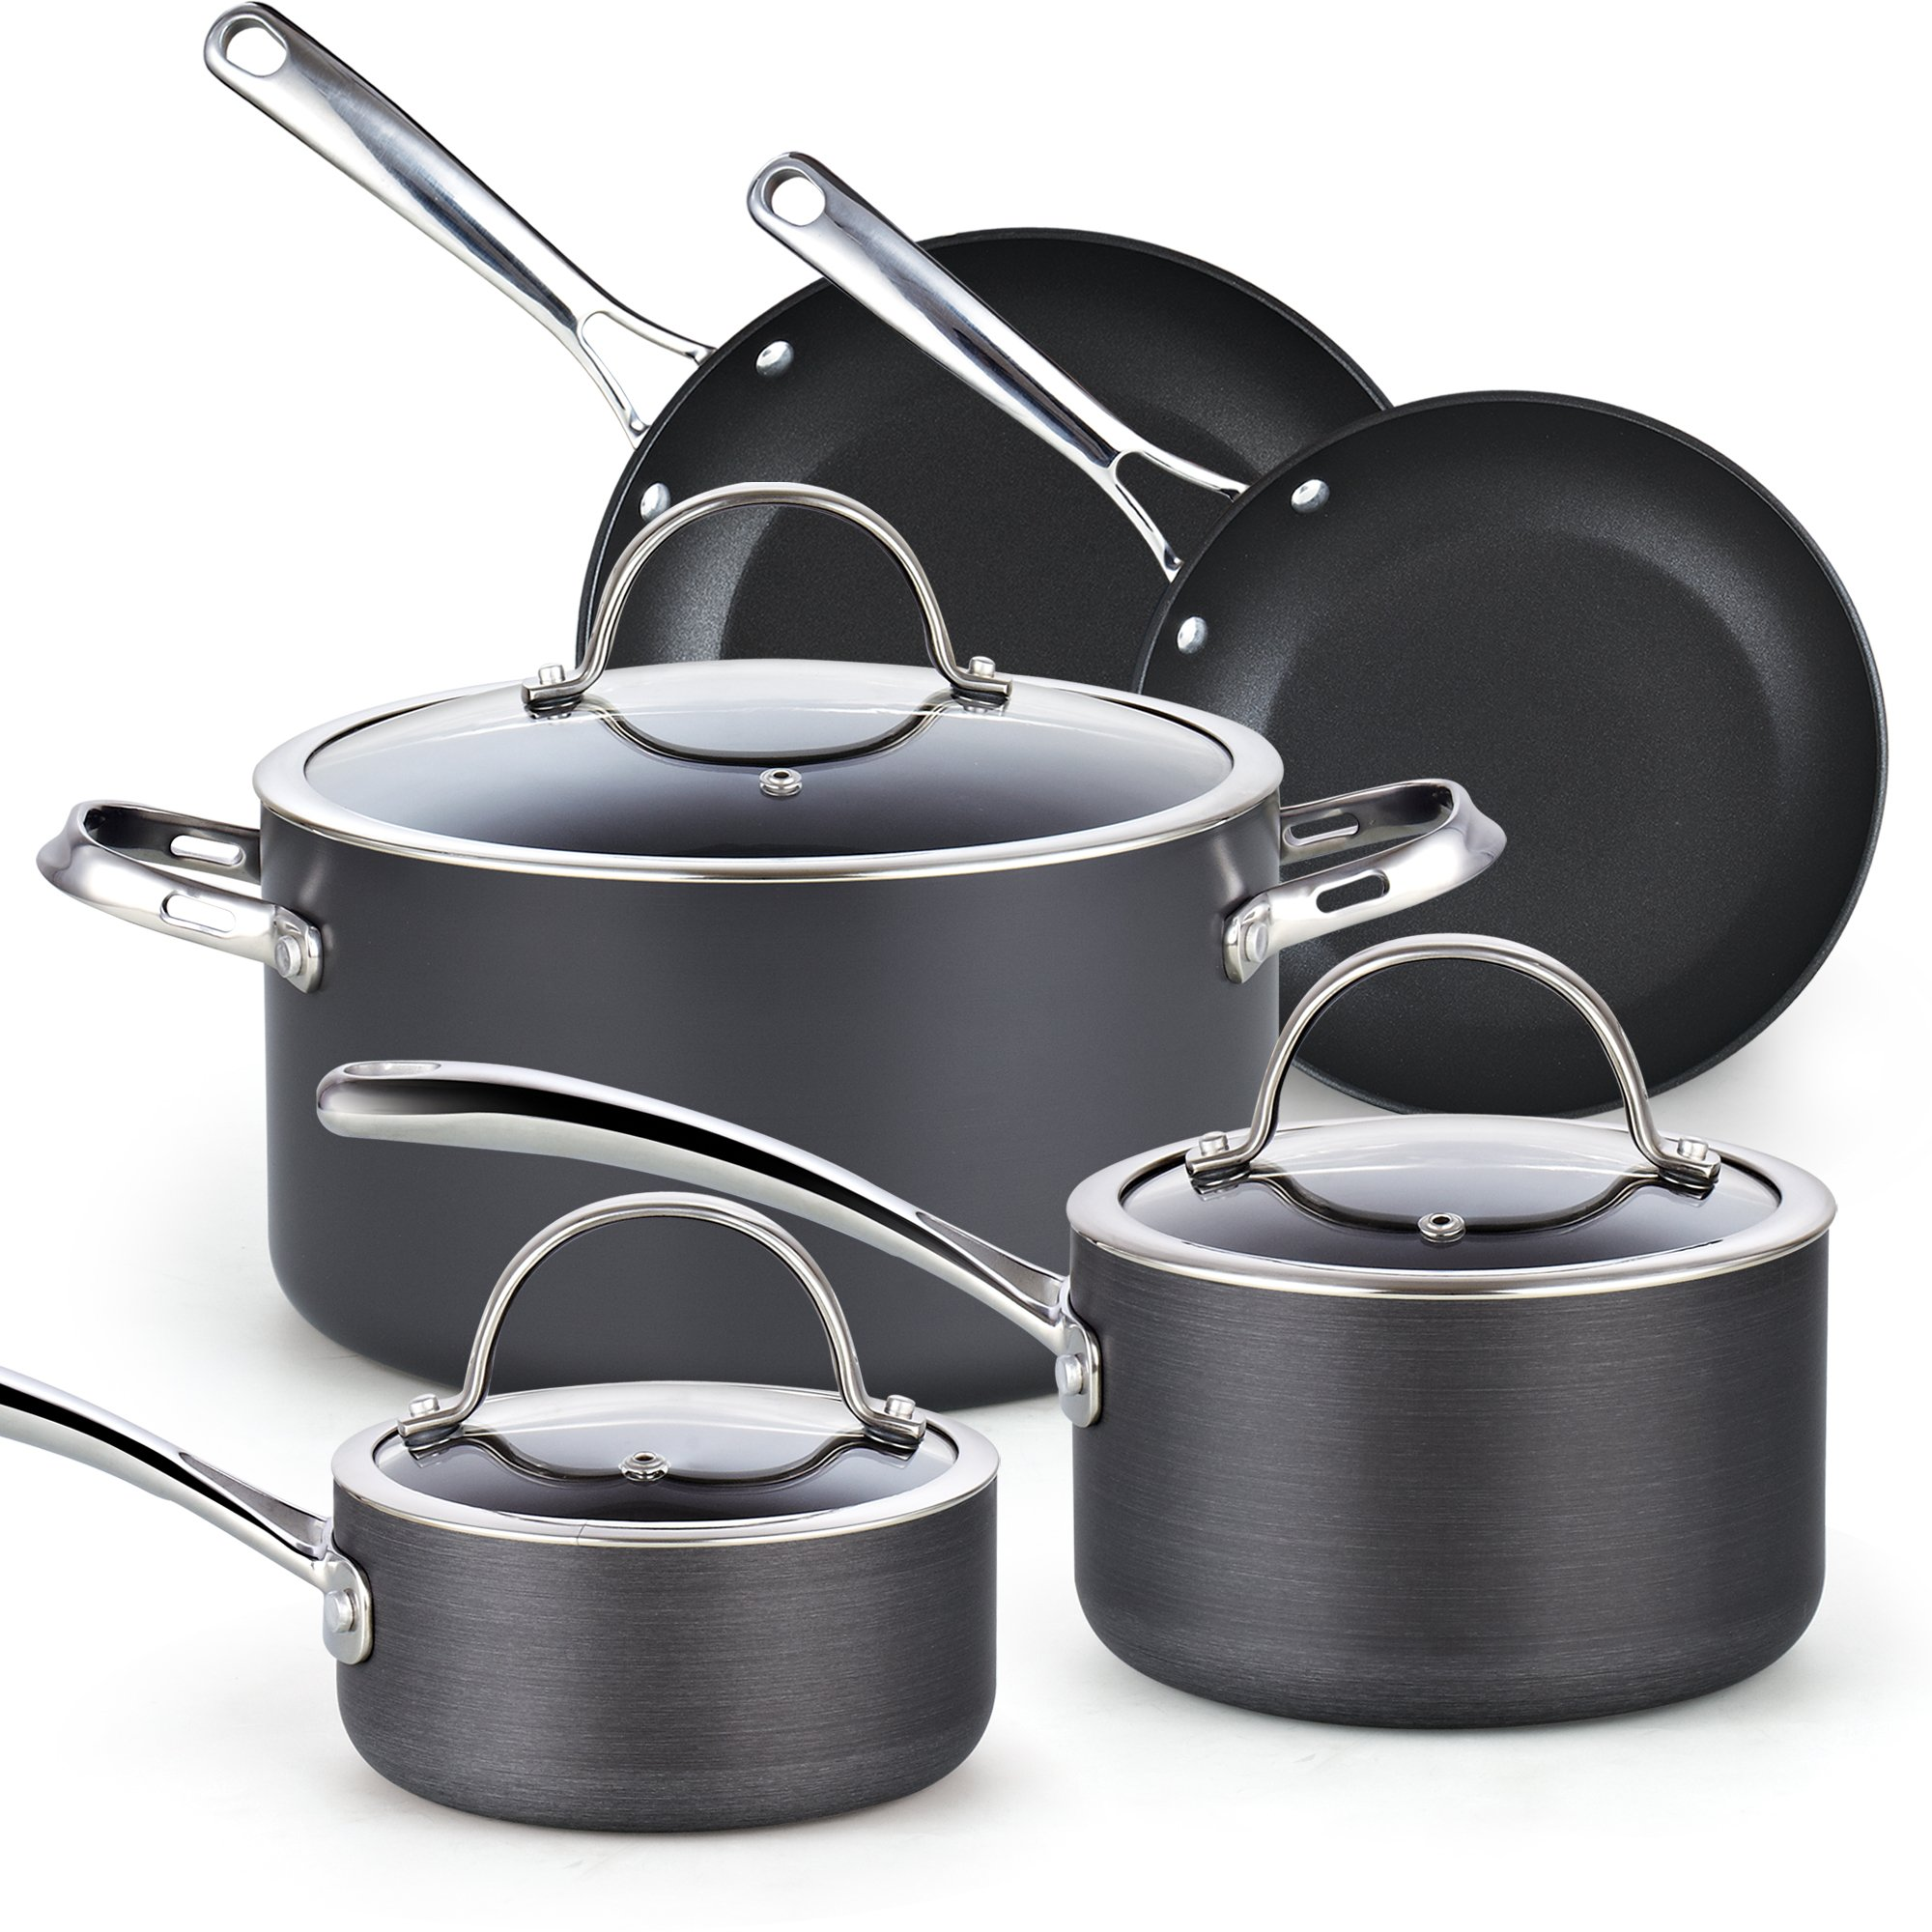 Cooks Standard 8-Piece Nonstick Hard Anodized Cookware Set, Black